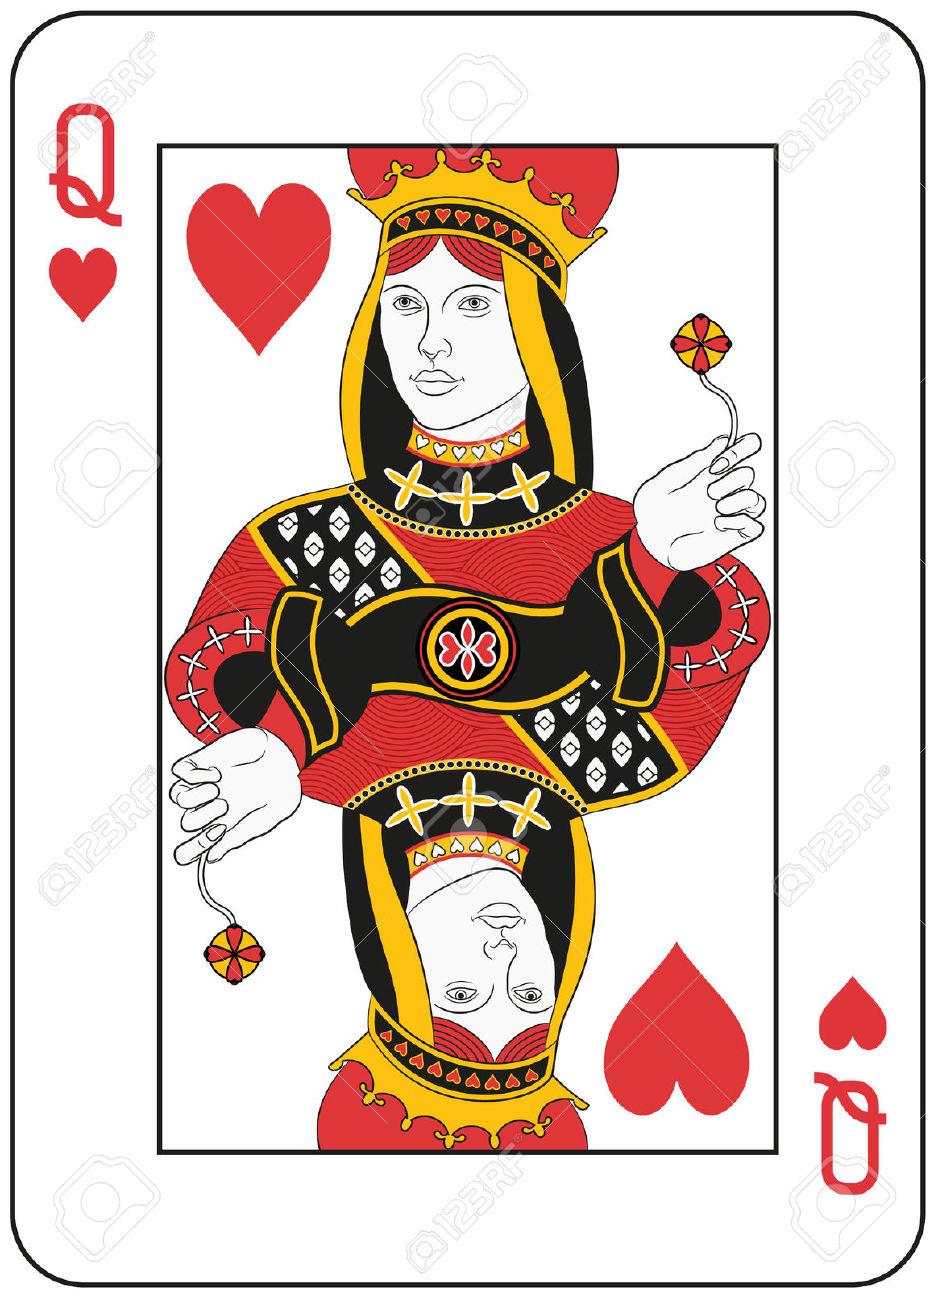 queen of hearts: Queen of hearts. Origin-queen of hearts: Queen of hearts. Original design-12